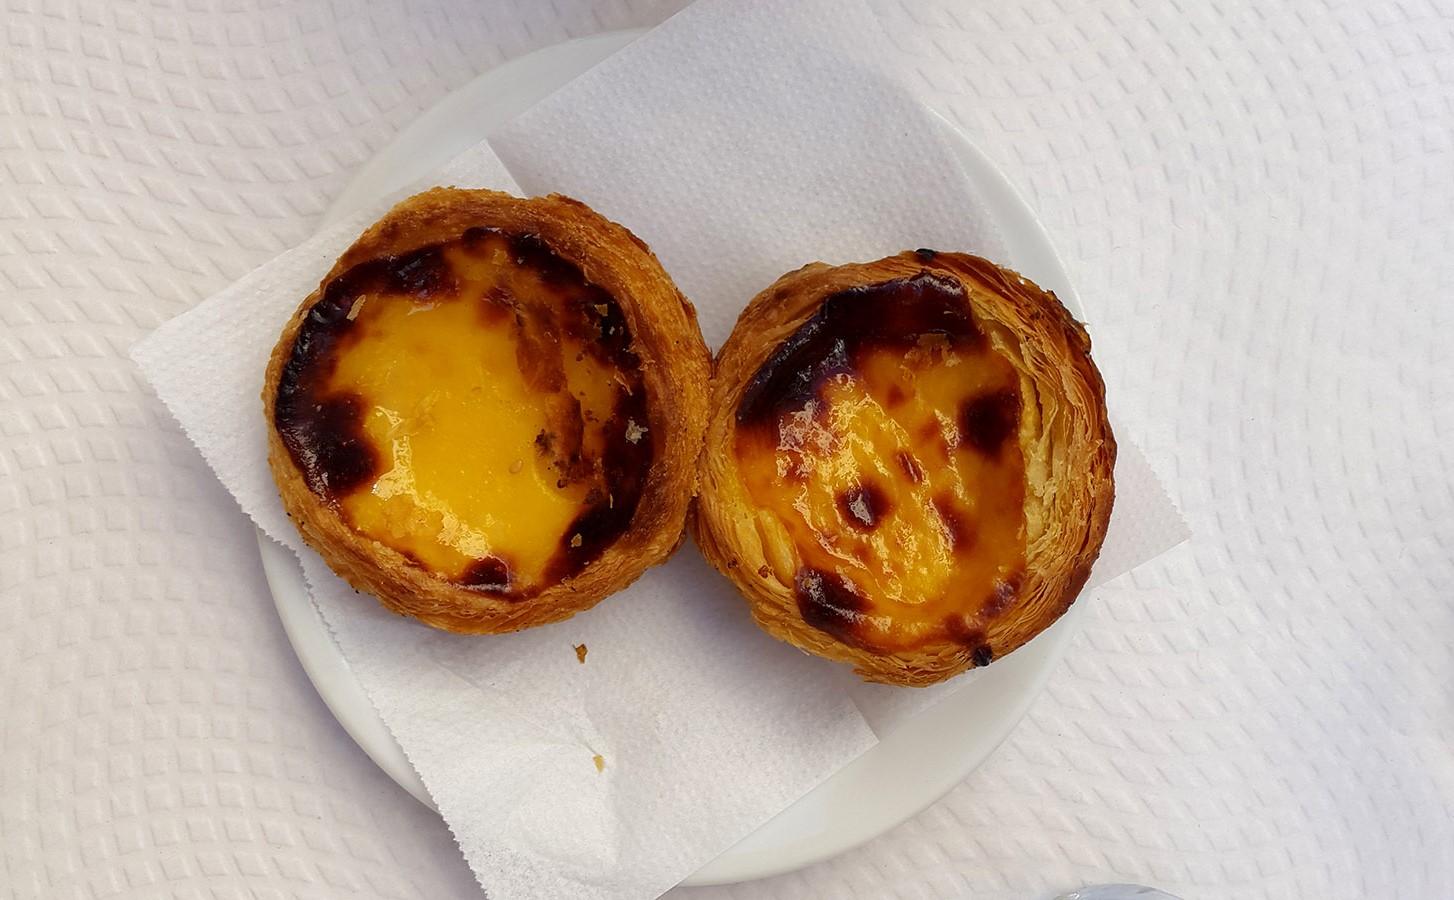 Pastel de nata - best pastry in Lisbon